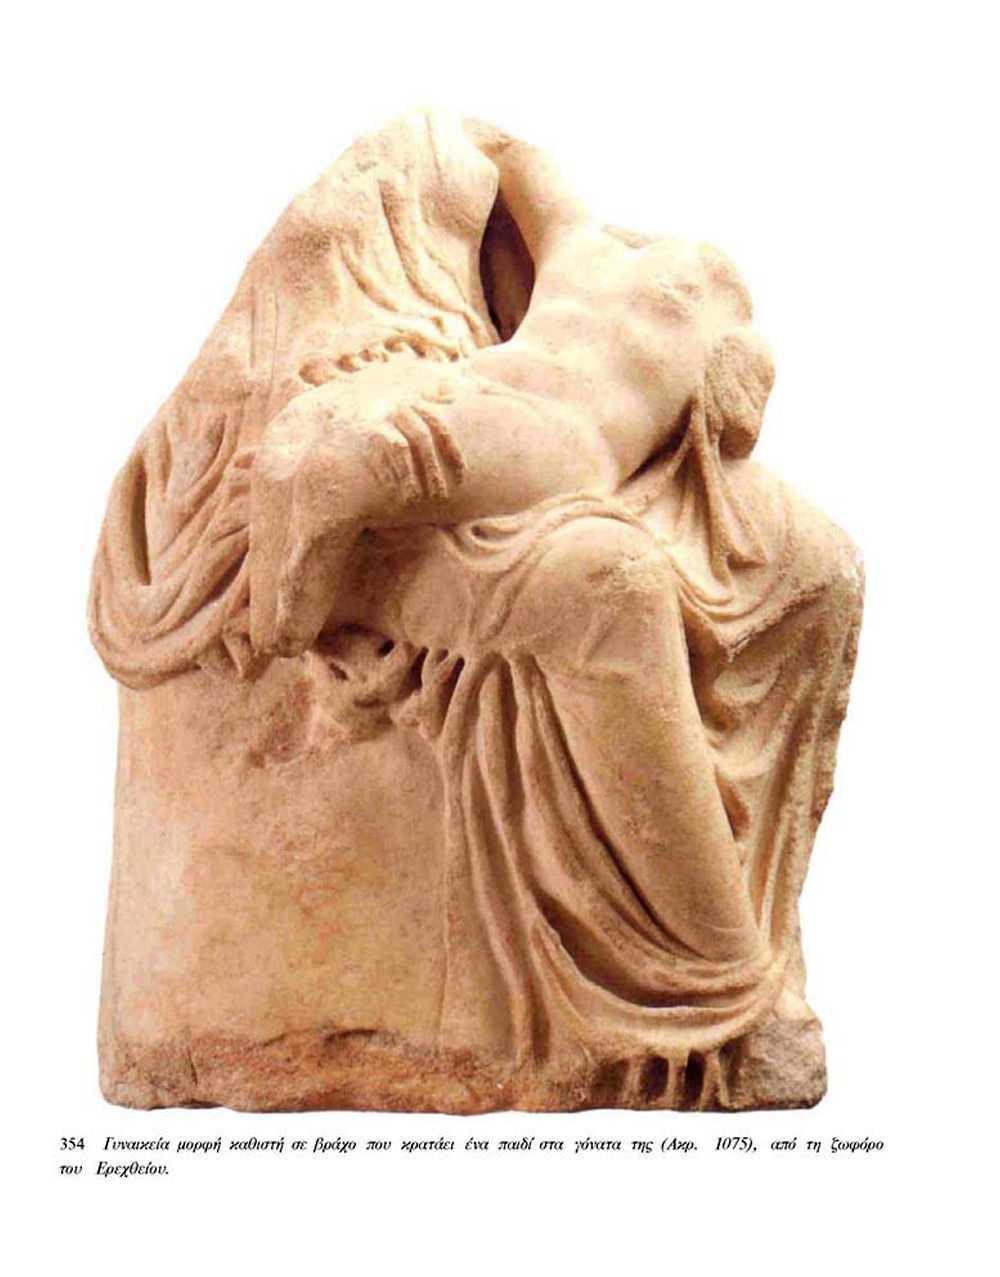 H:\K PALAIOLOGOS\ISTORIKA\ΑΡΧΑΙΟΛΟΓΙΚΟ ΑΚΡΟΠΟΛΕΩΣ\acropolis-p347-1.JPG